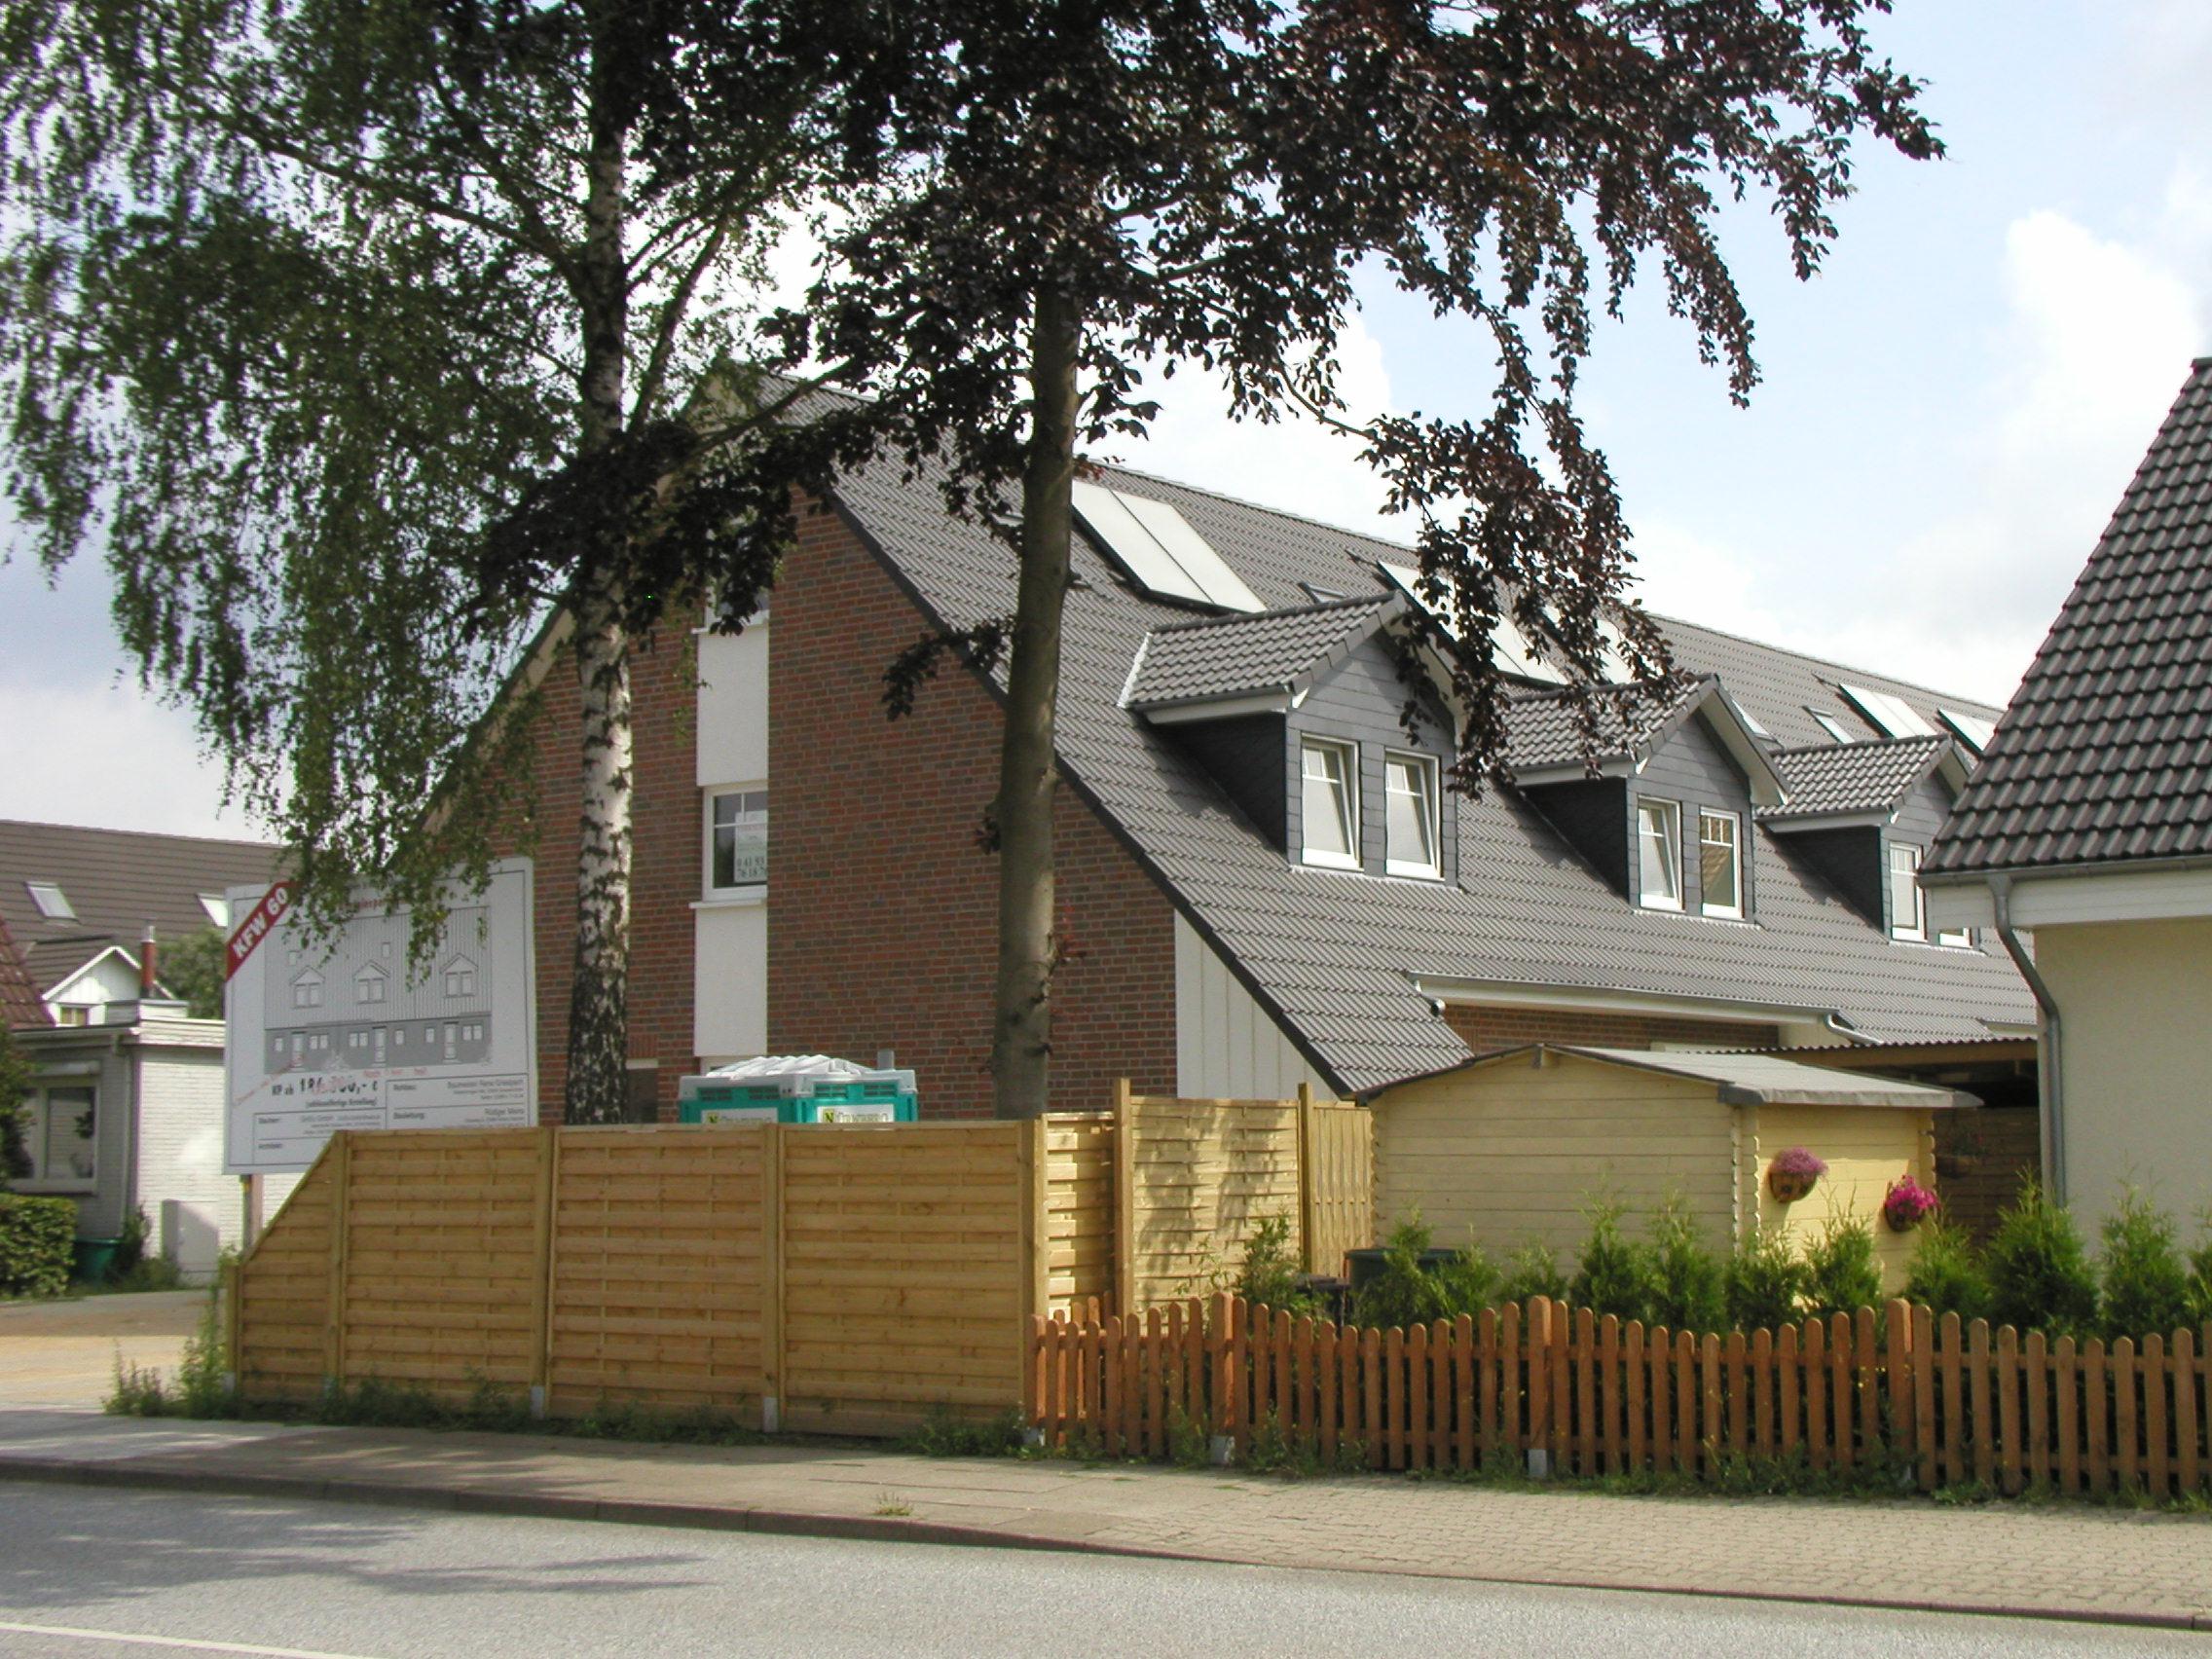 Mehrfamilienhaus Vorstadt